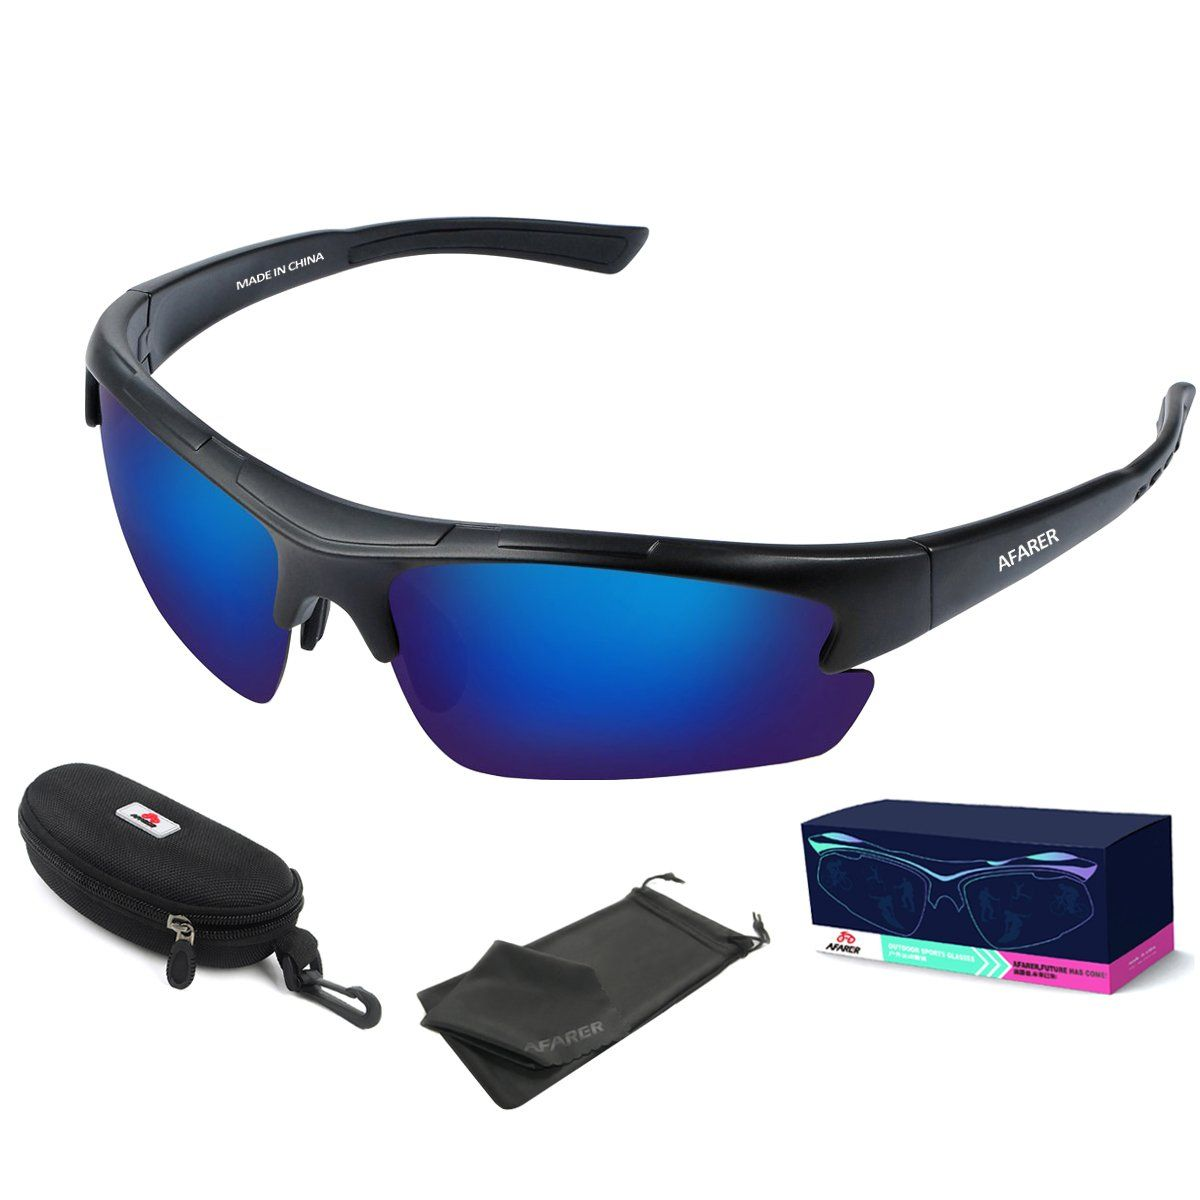 AFARER polarized sports sunglasses for mens womens fishing